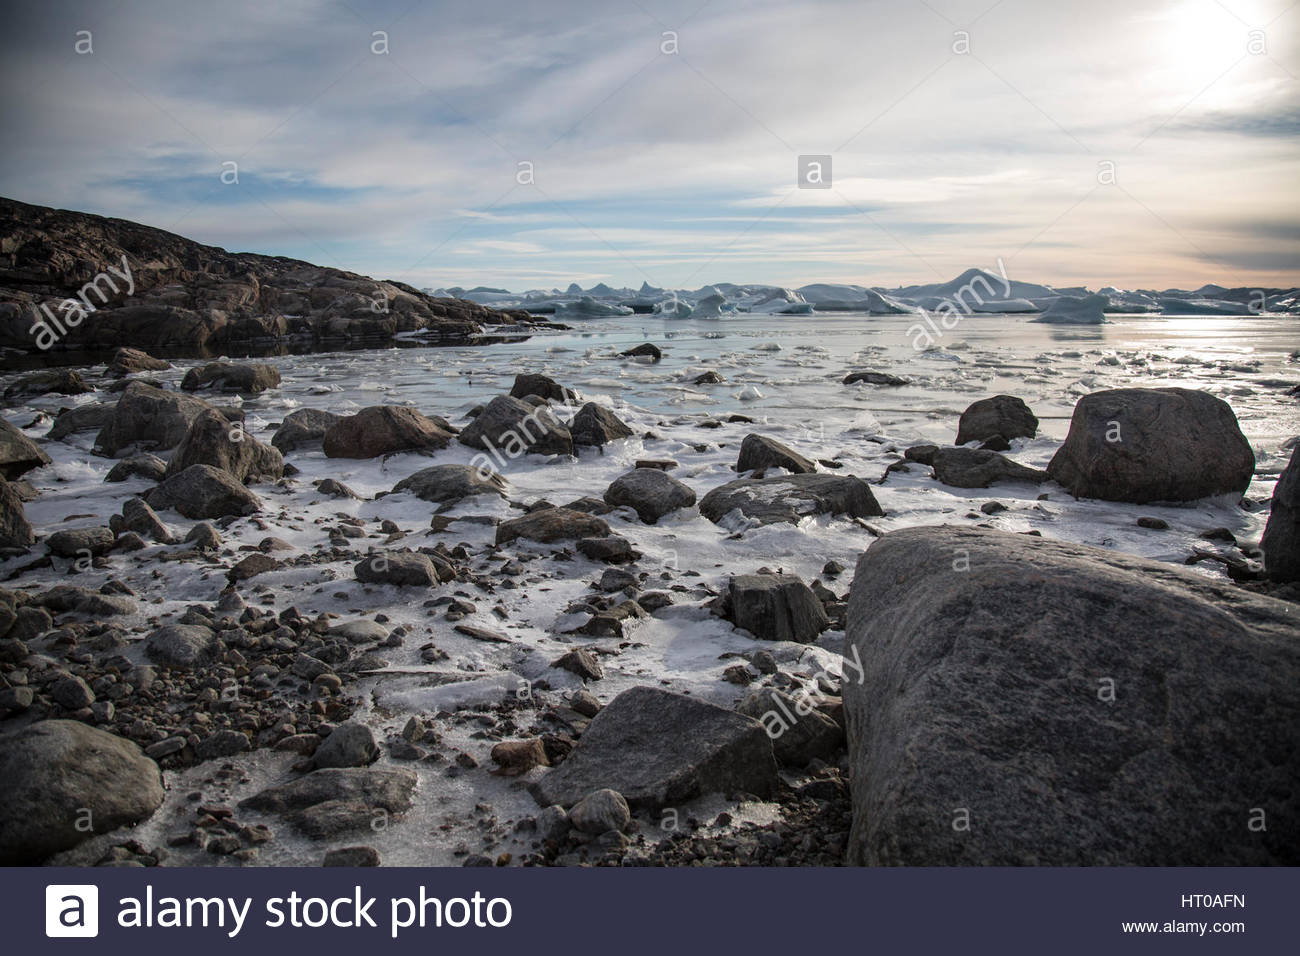 Greenland Ice fjord Beach Nearing Twighlight Stock Photo